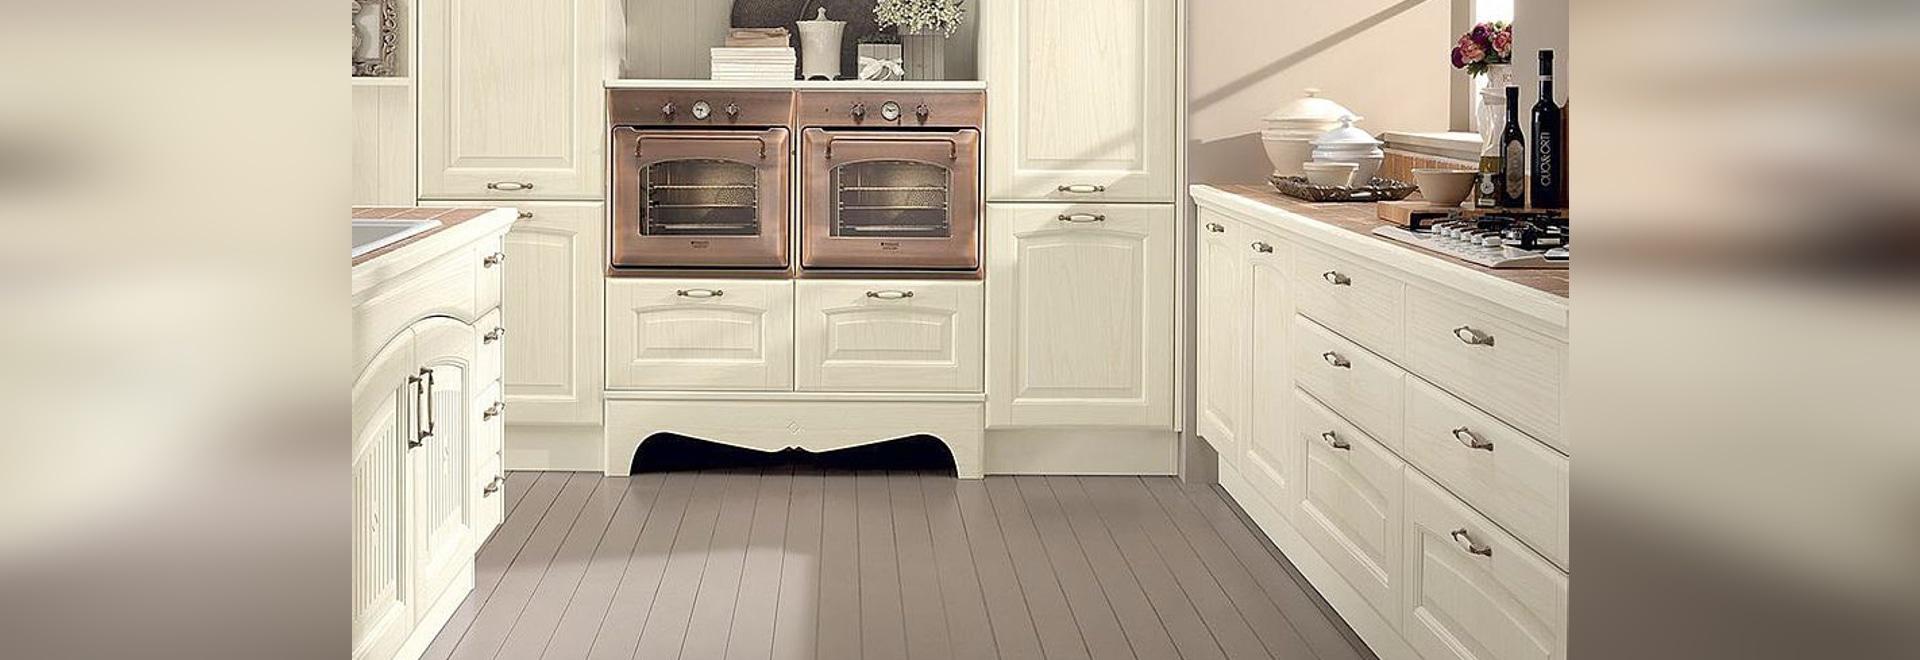 NOVITÀ: cucina classica by CUCINE LUBE - CUCINE LUBE